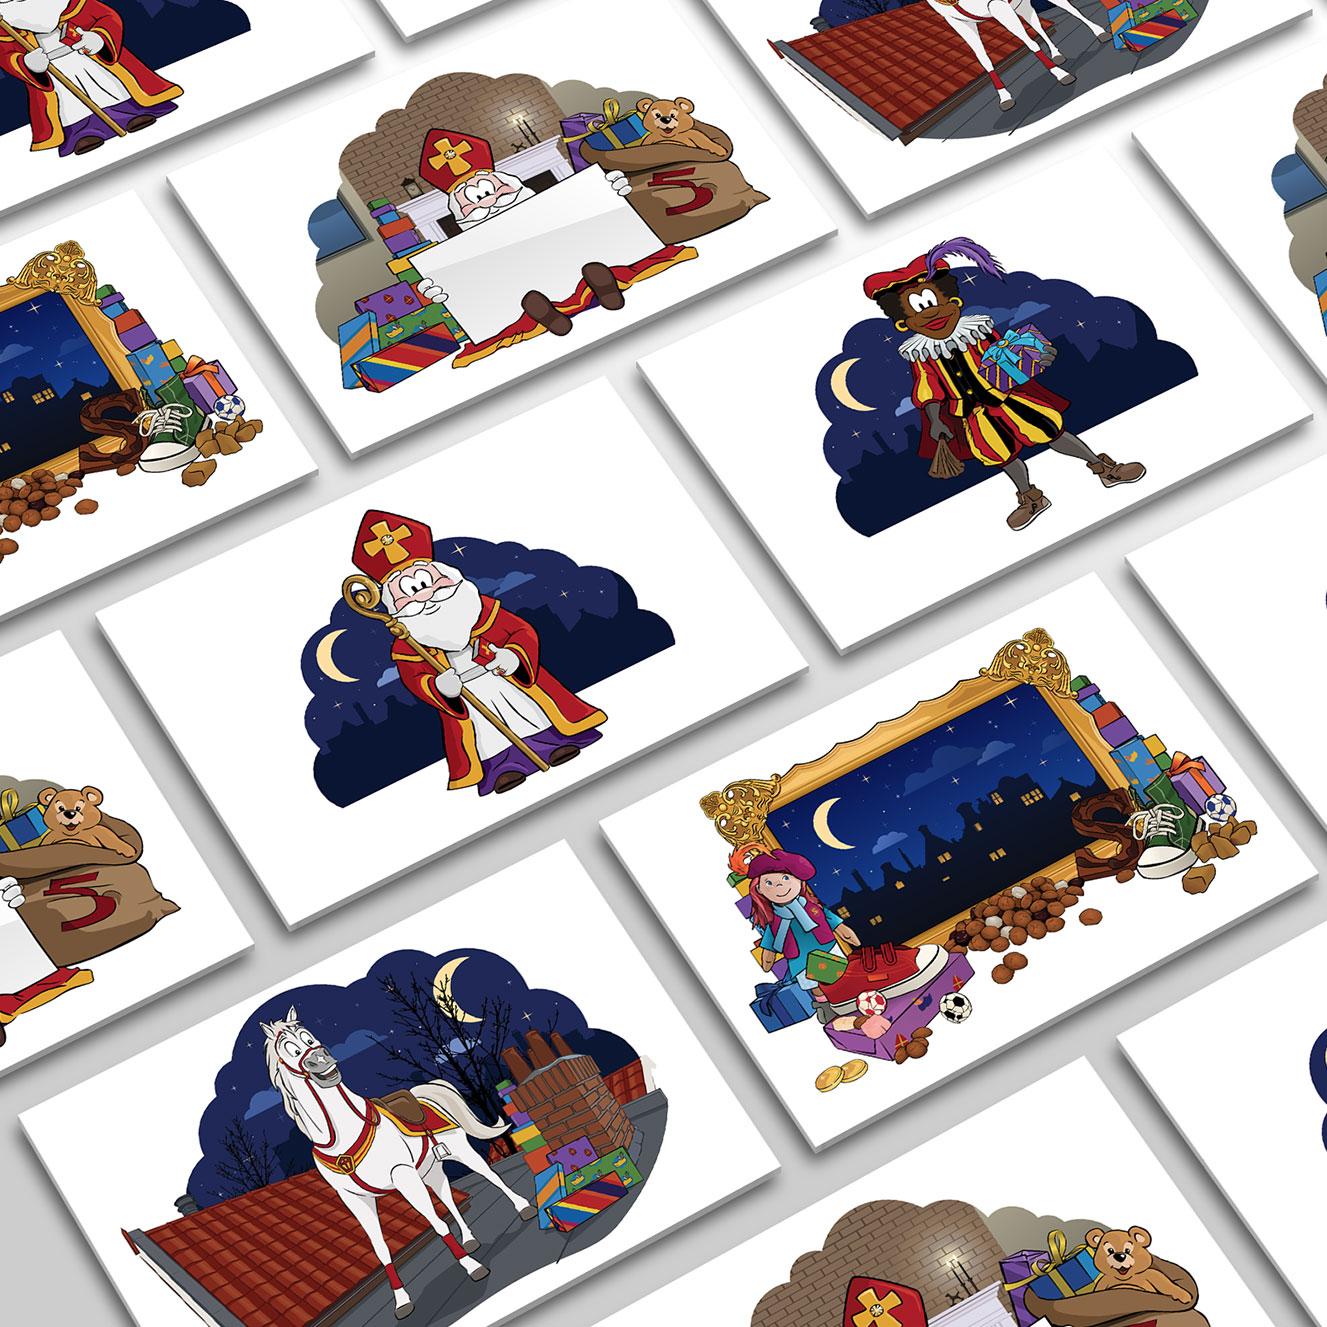 Sinterklaas Zwarte Piet Illustratie Artwork Overzicht